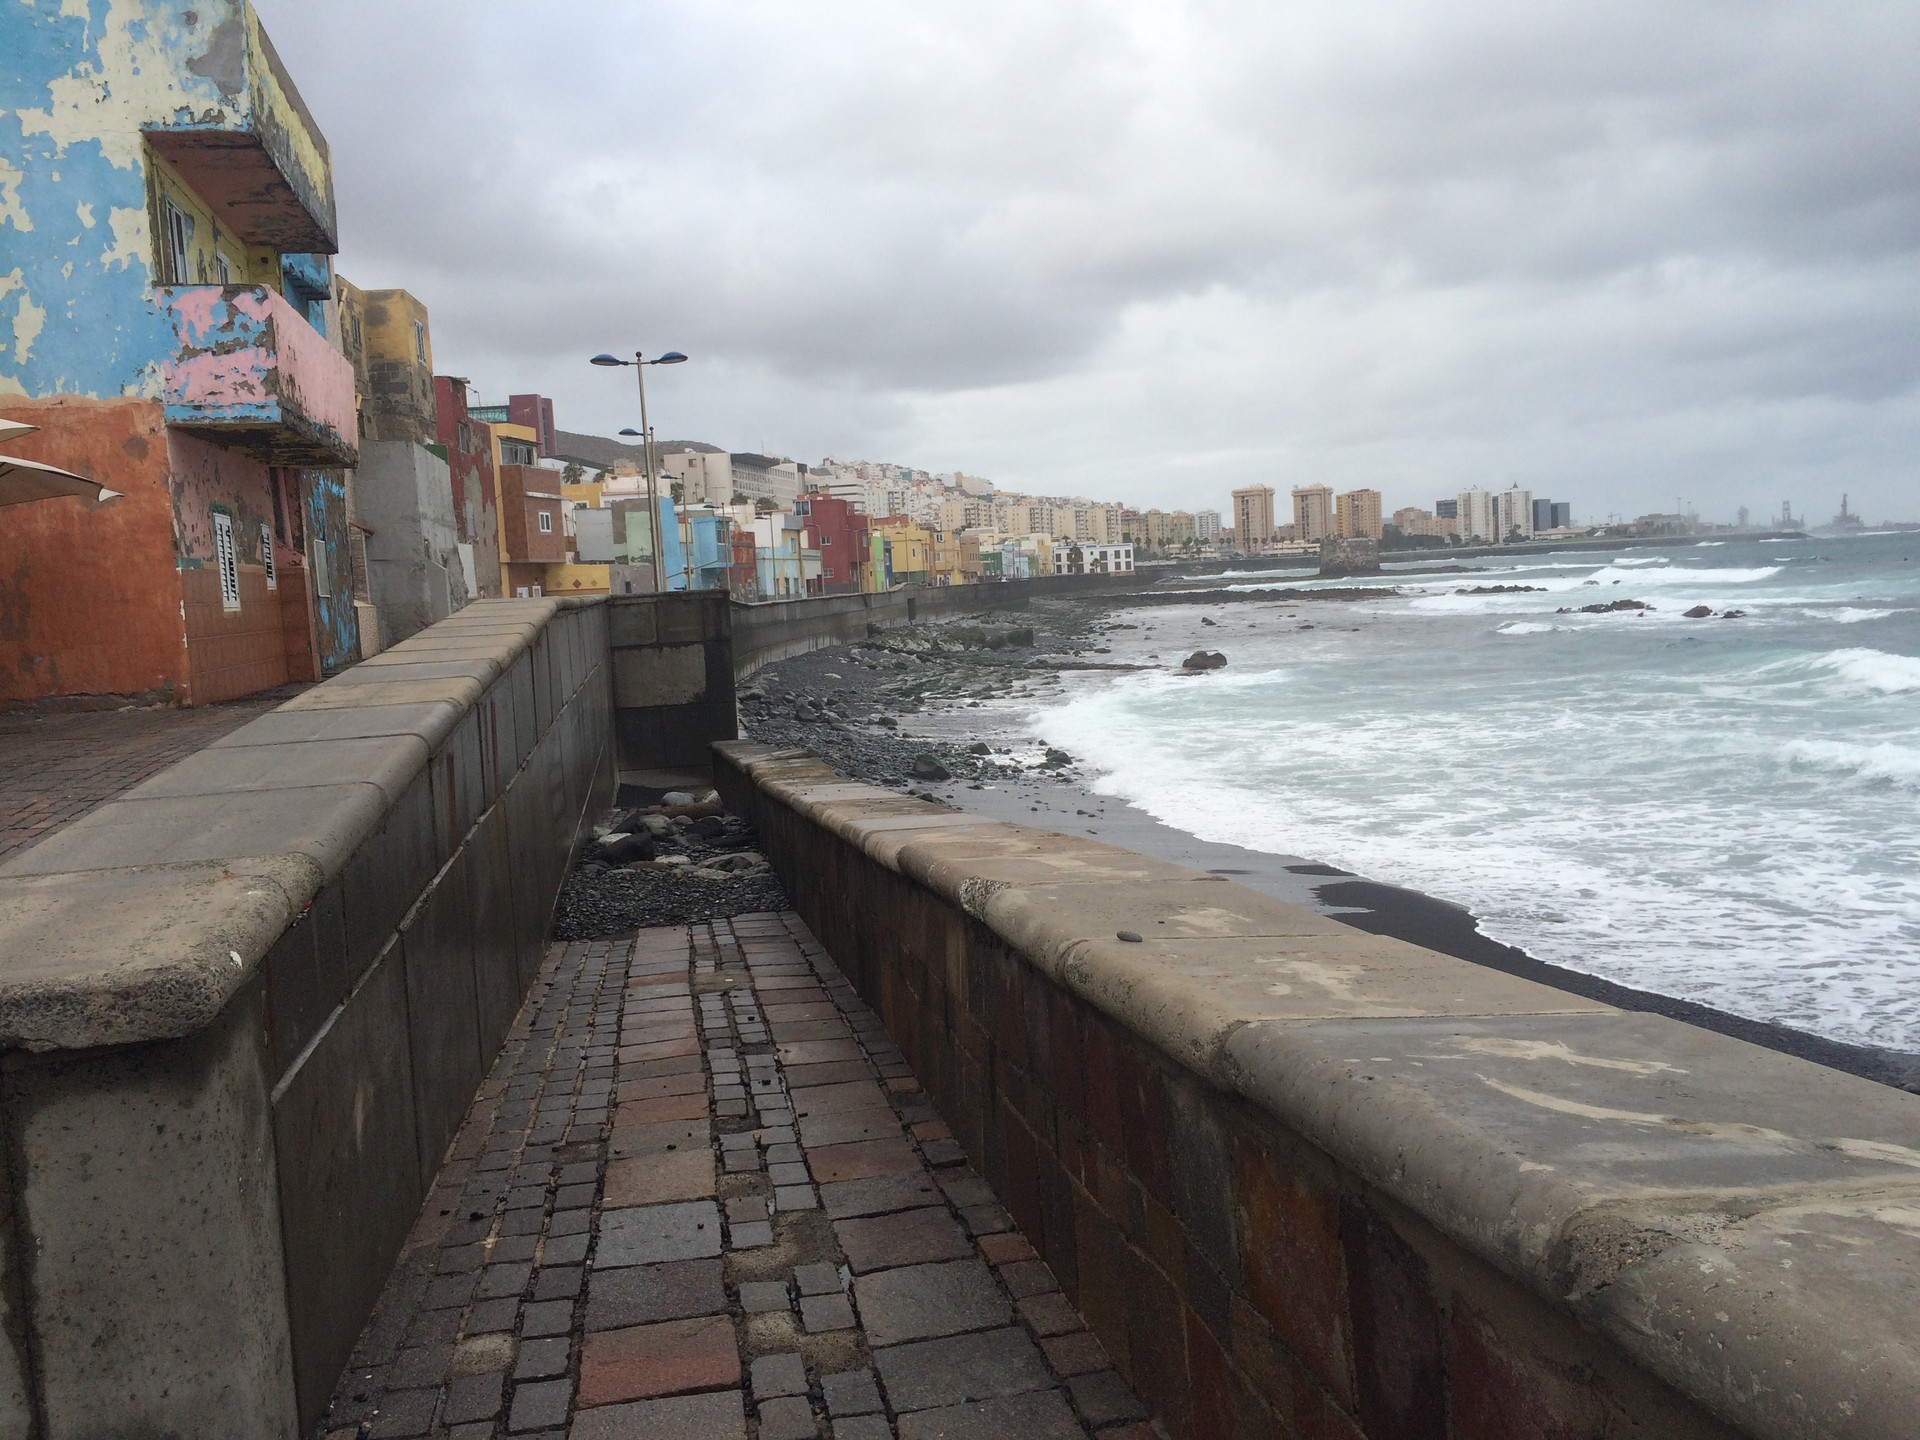 barrio-pesquero-san-cristobal-97f234f5c1